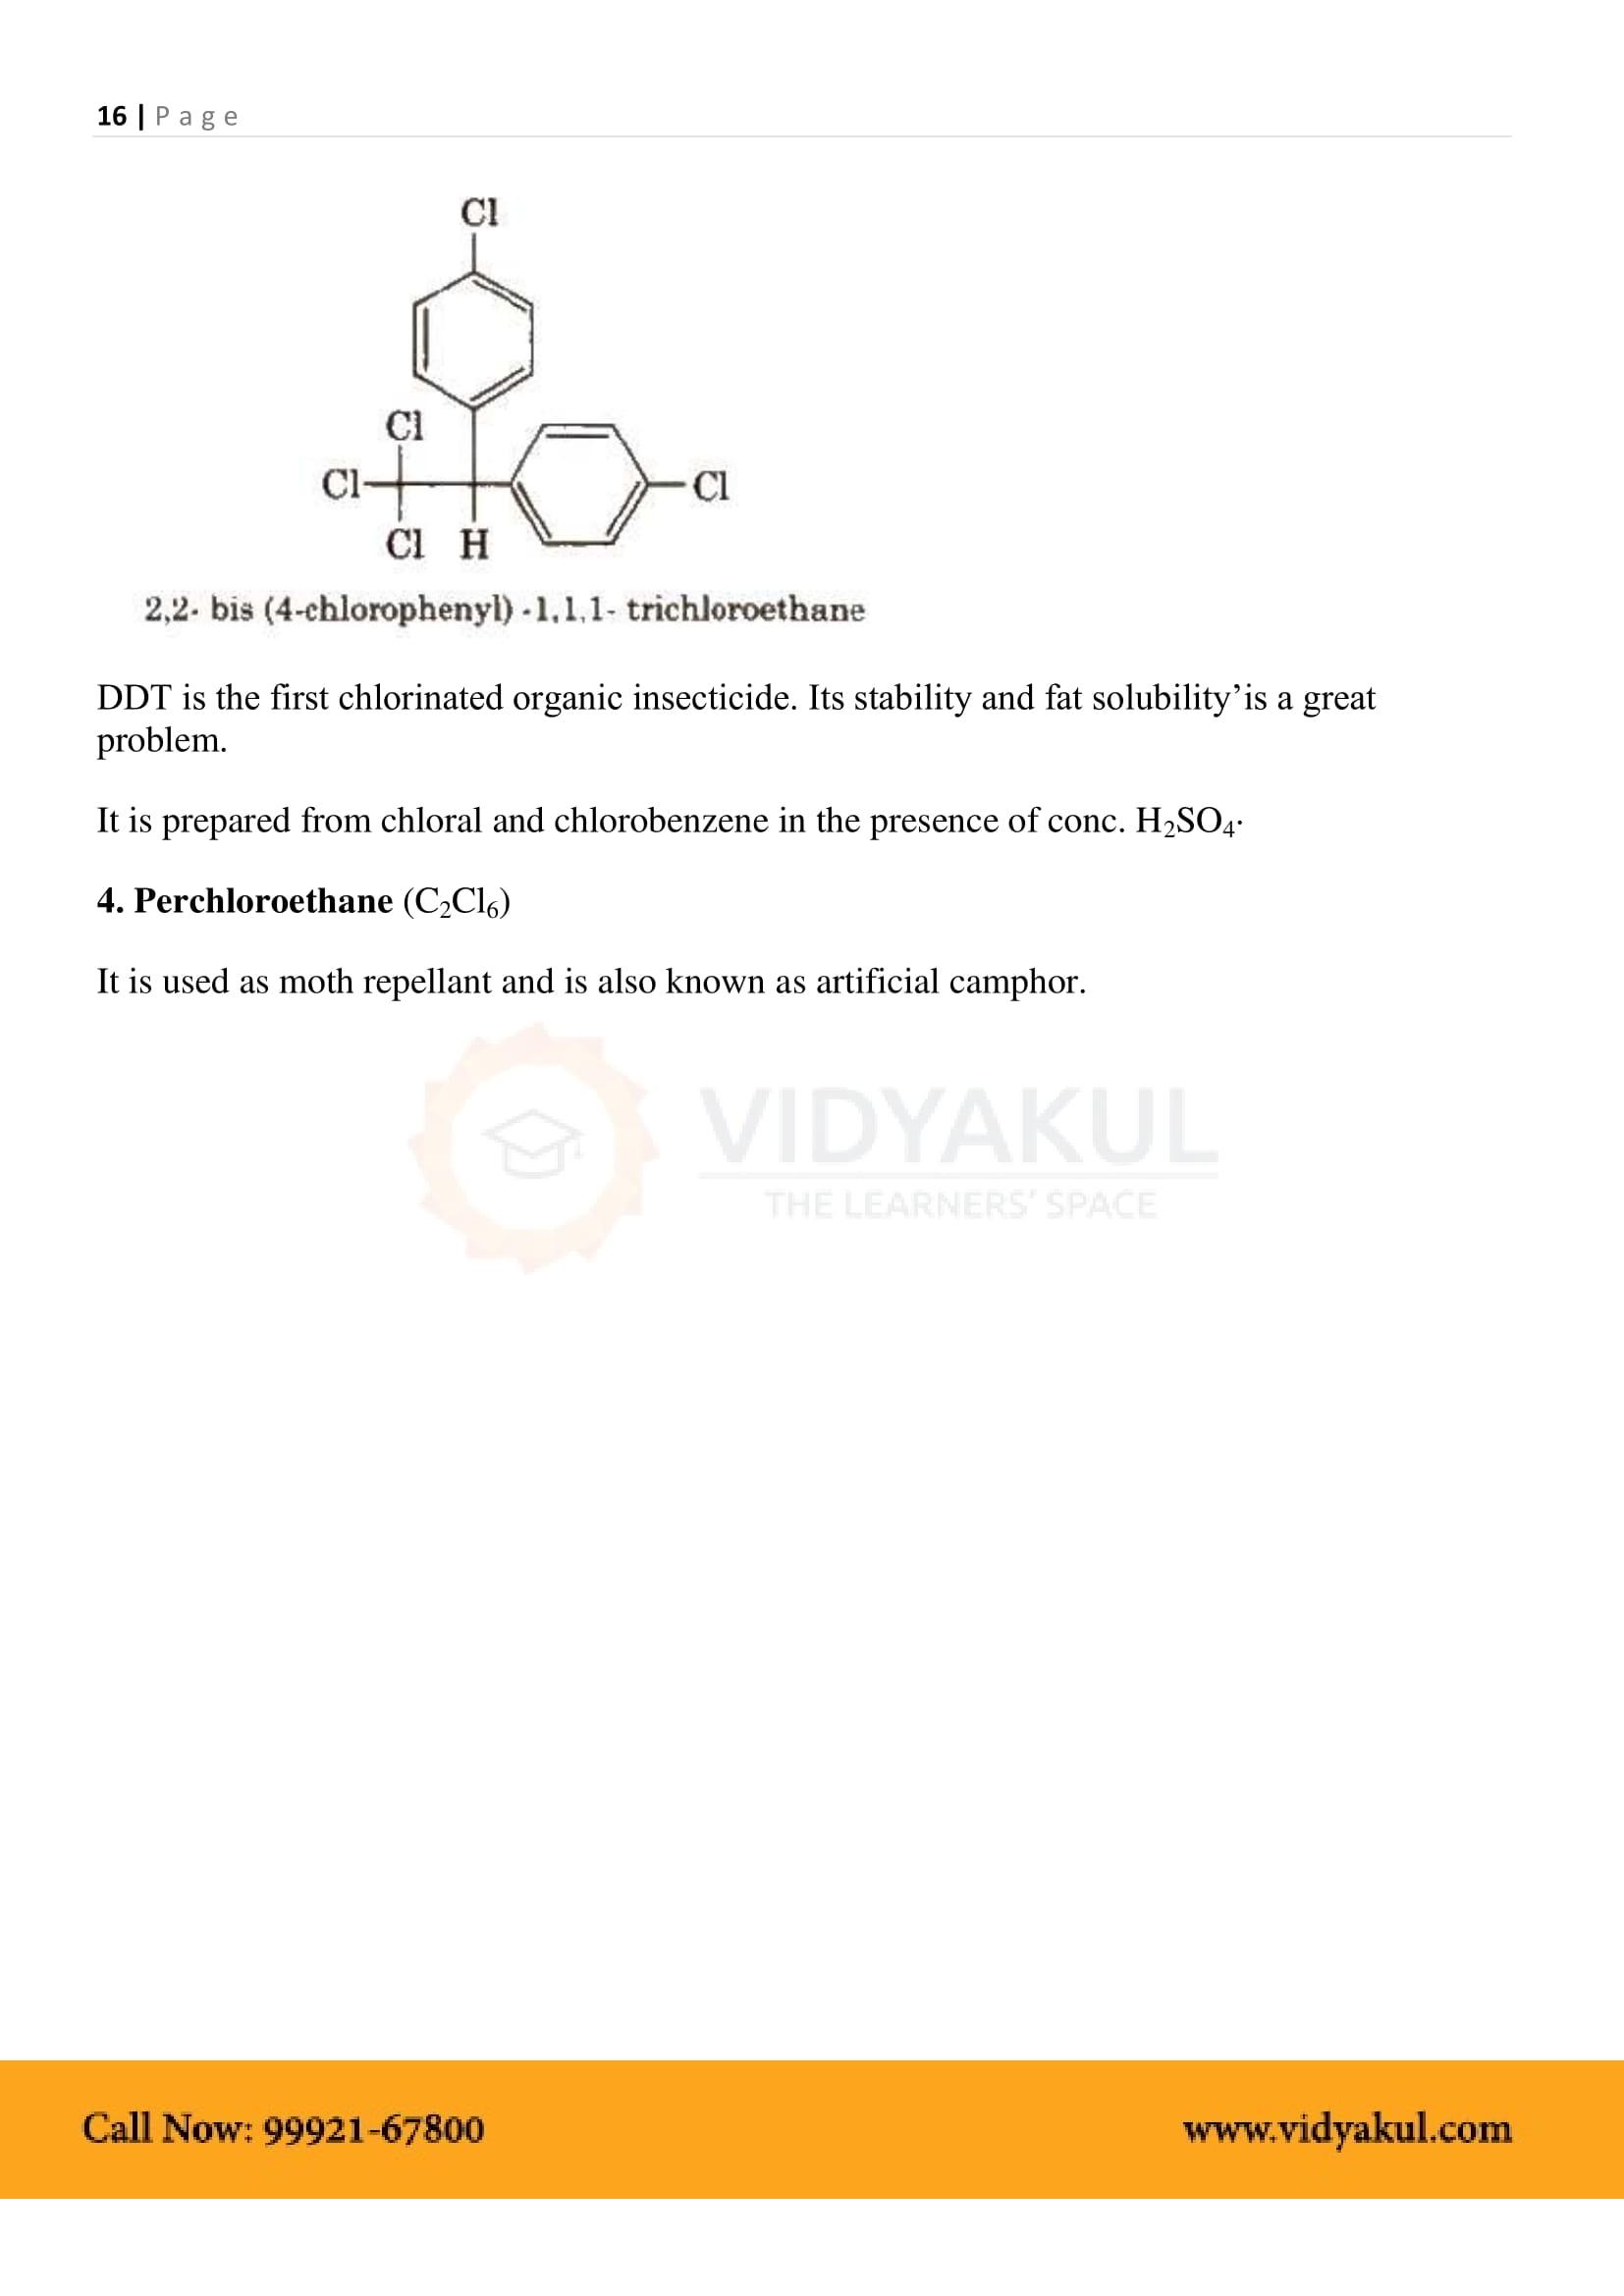 Haloalkanes and Haloarenes Class 12 Notes | Vidyakul